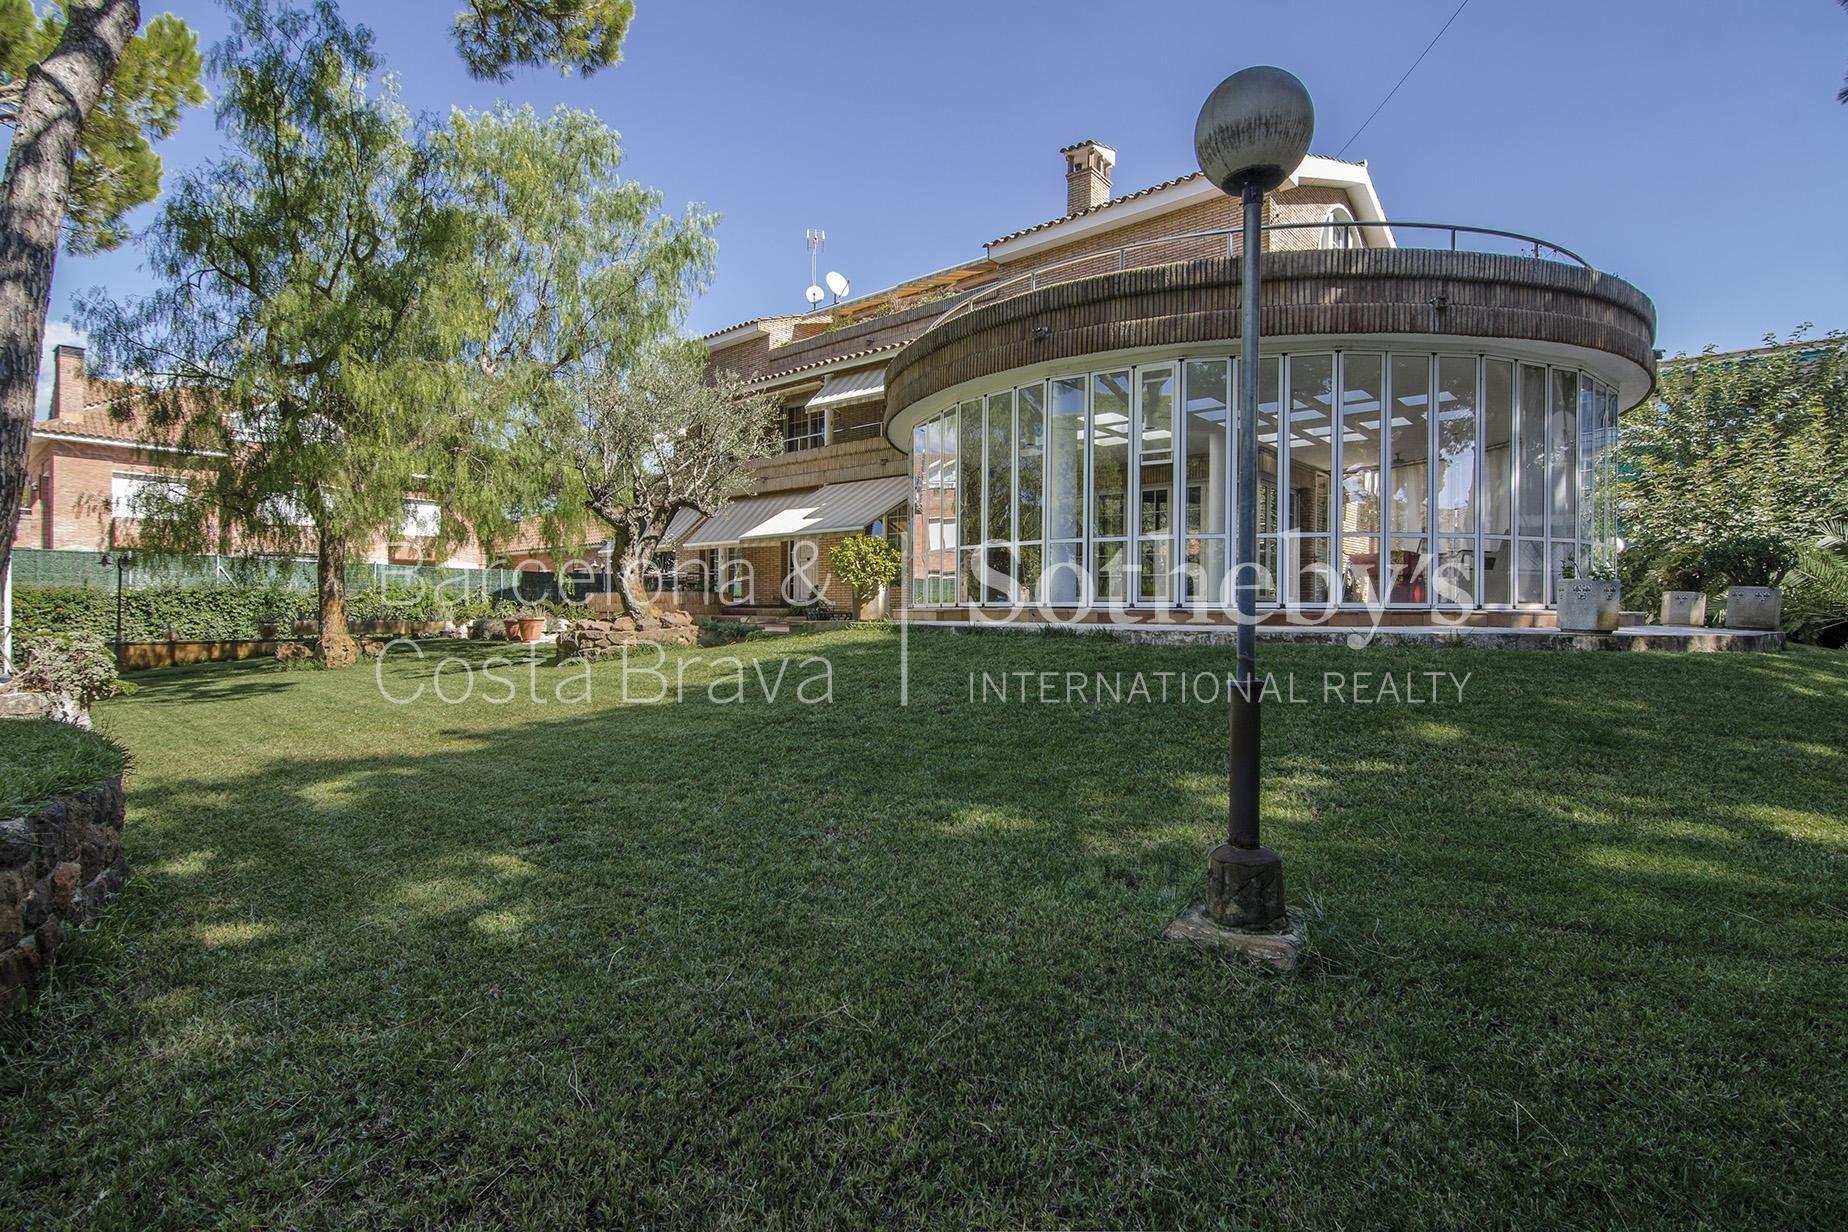 Maison unifamiliale pour l Vente à Spectacular Property Few Meters From the Sea in Castelldefels Castelldefels, Barcelona 08866 Espagne